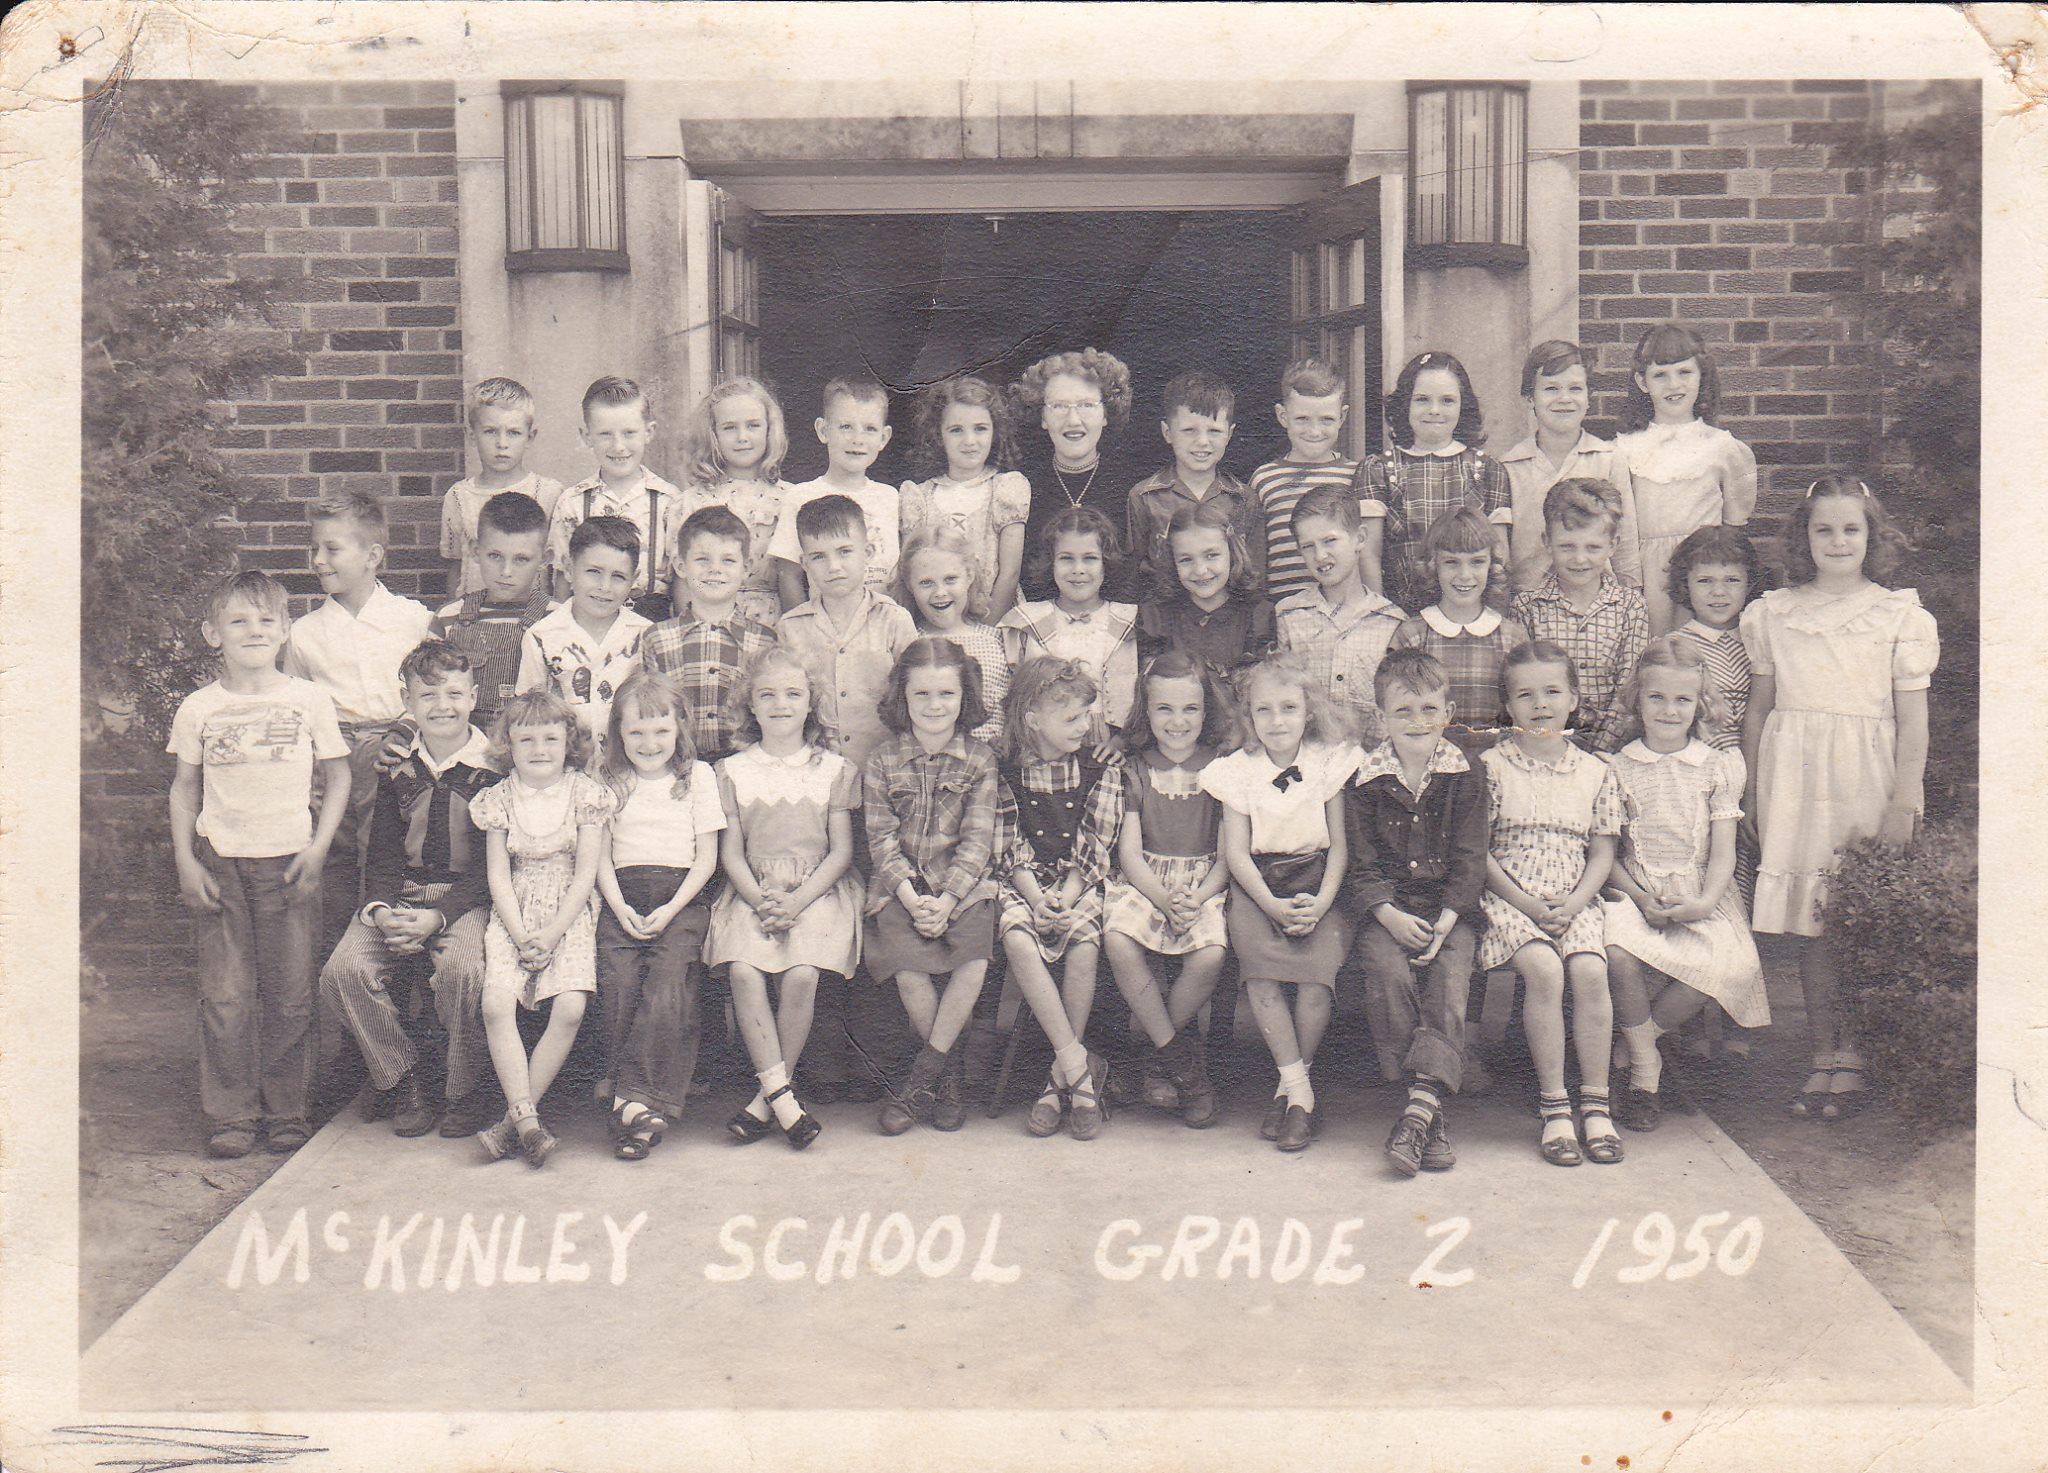 #104 McKINLEY GRADE 2 1950 PARSONS, KS